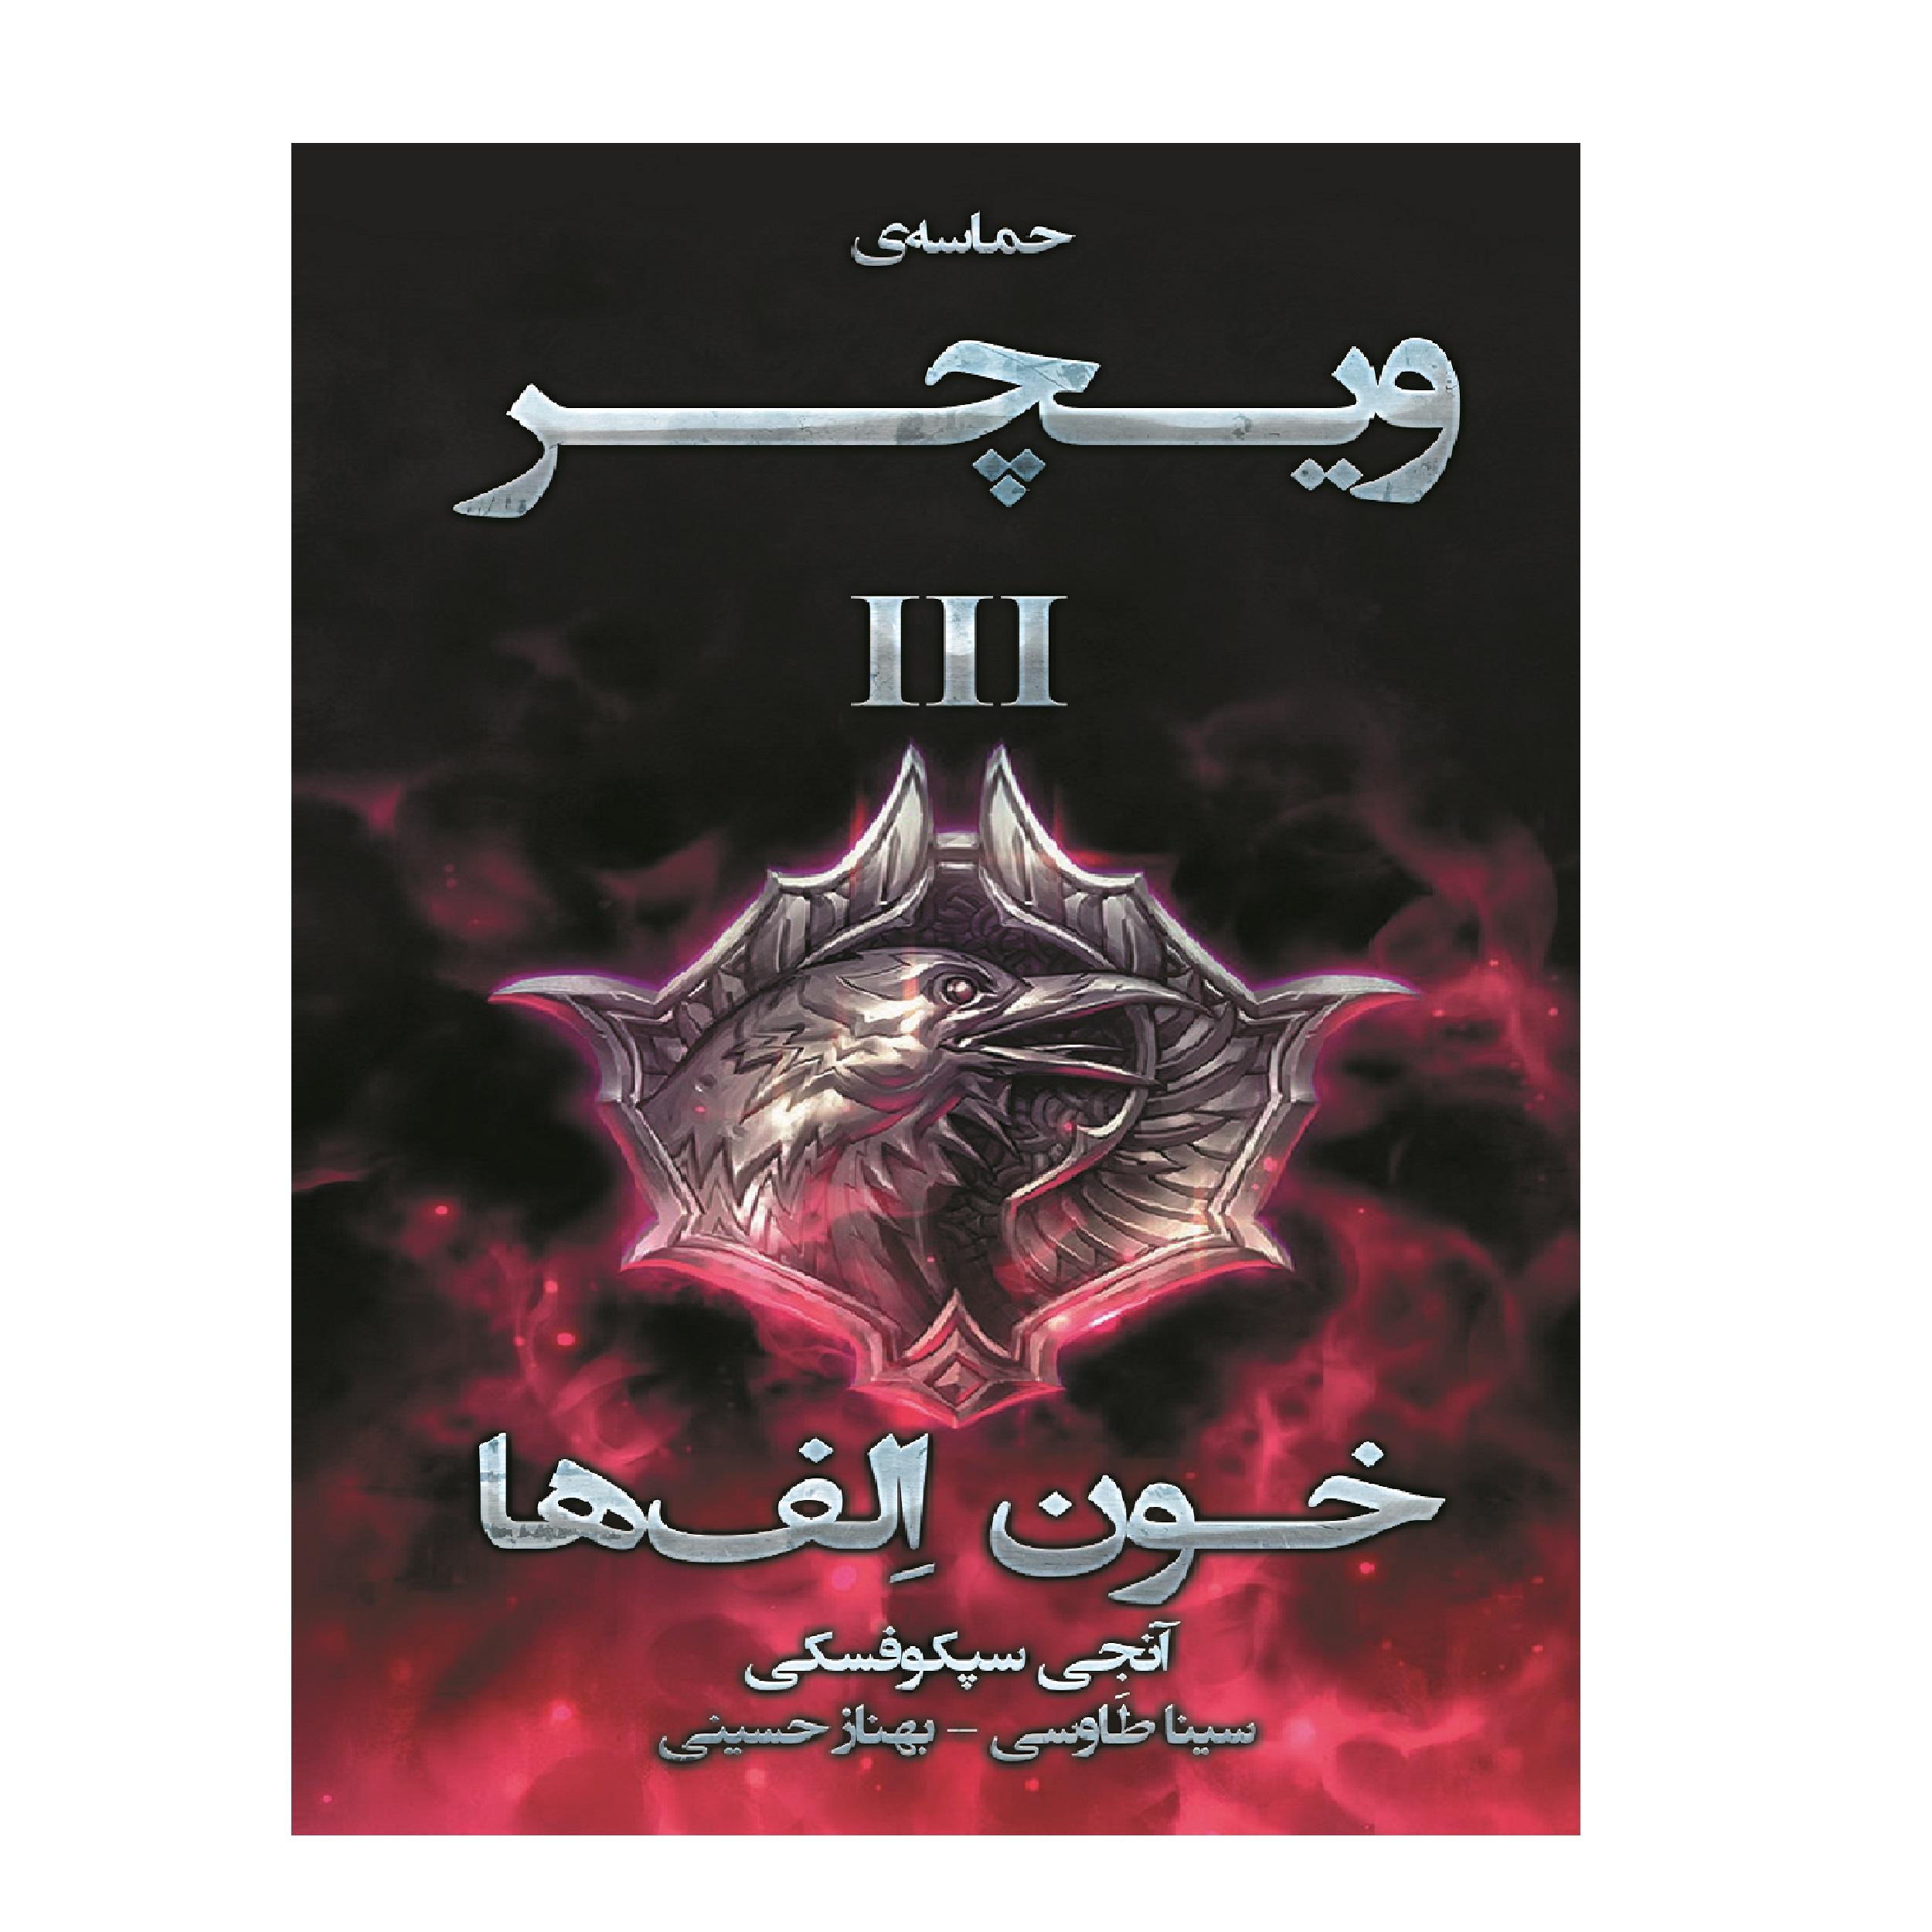 خرید                      کتاب حماسه ی ویچر خون الف ها کتاب سوم اثر آنجی سپکوفسکی انتشارات آذرباد